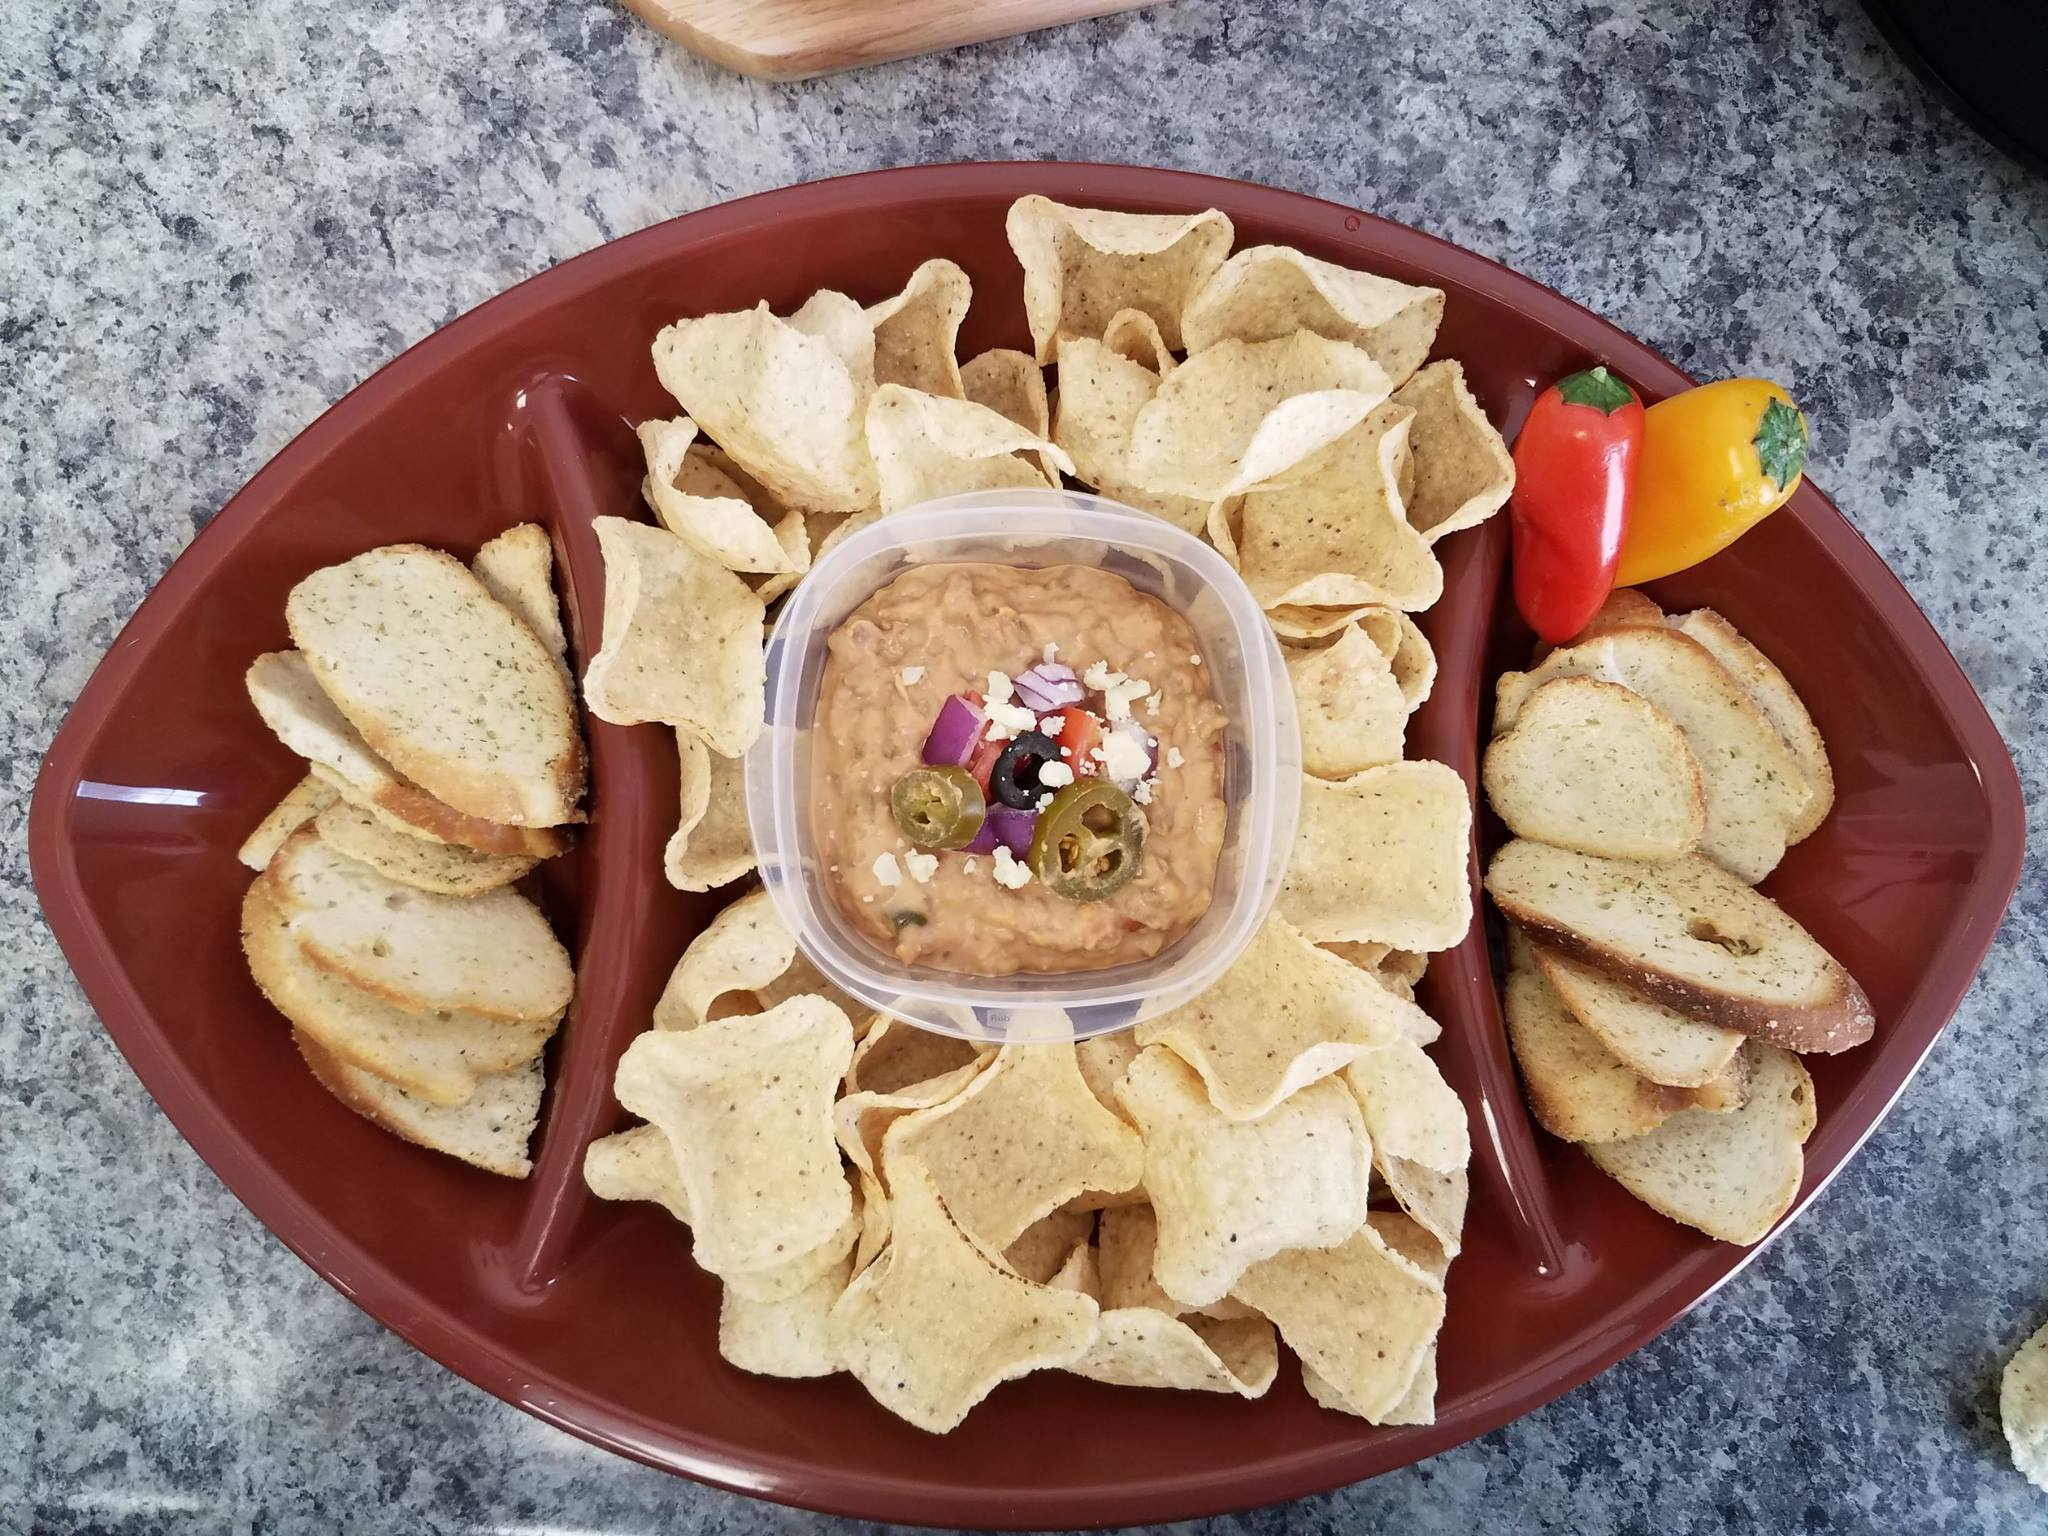 Spicy Fiesta Cheese Dip